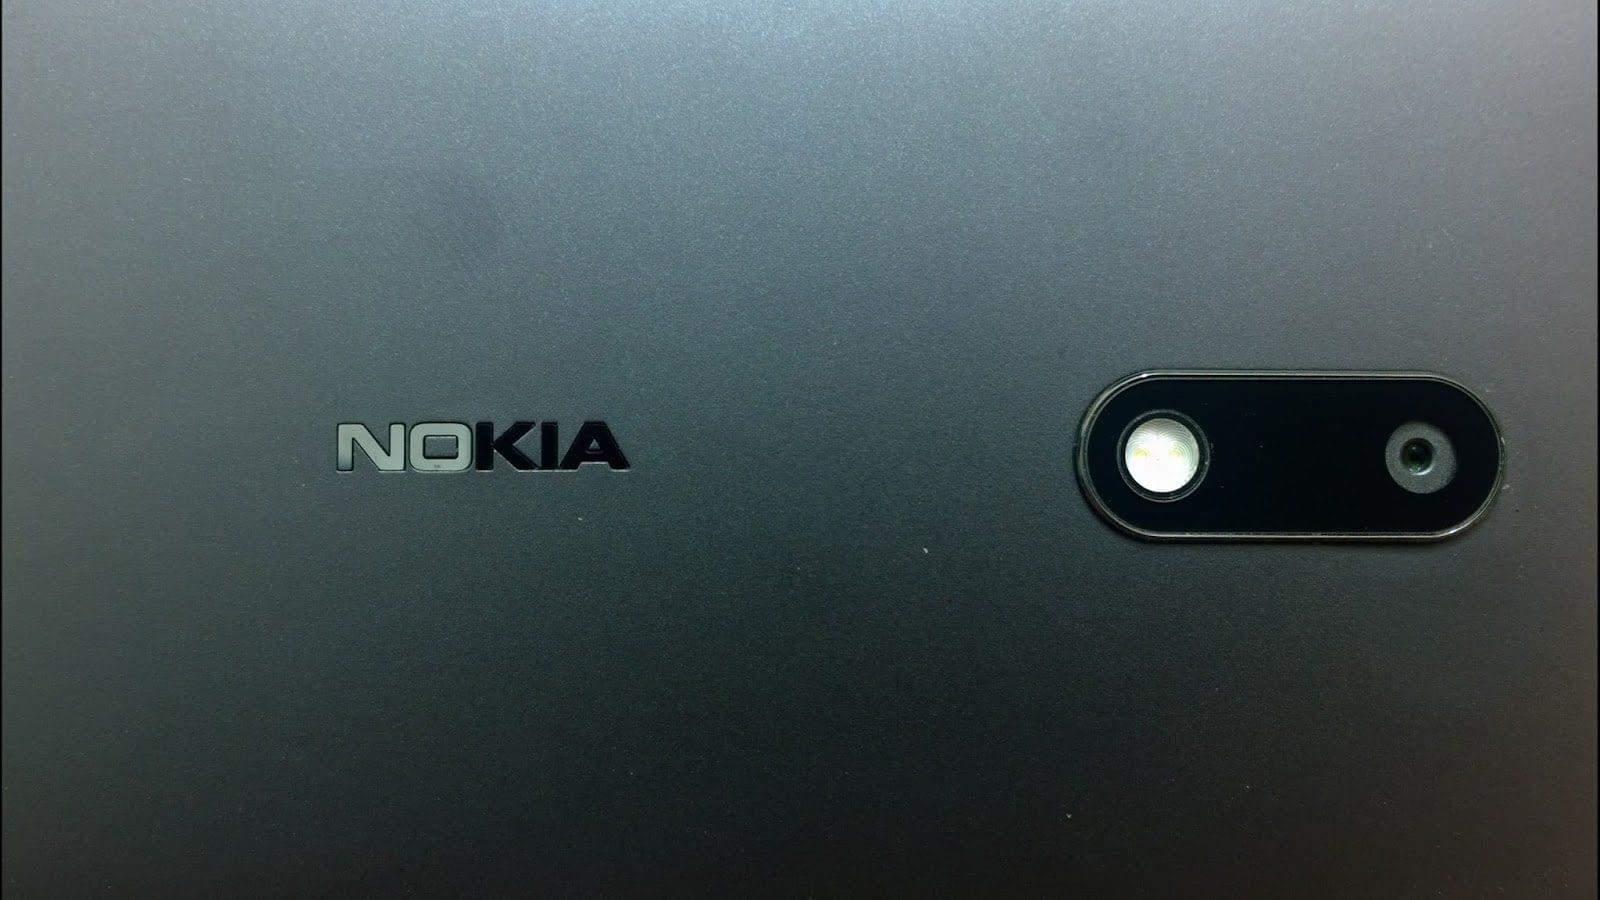 Report Logo On The Nokia 6 Losing Its Original Black Color